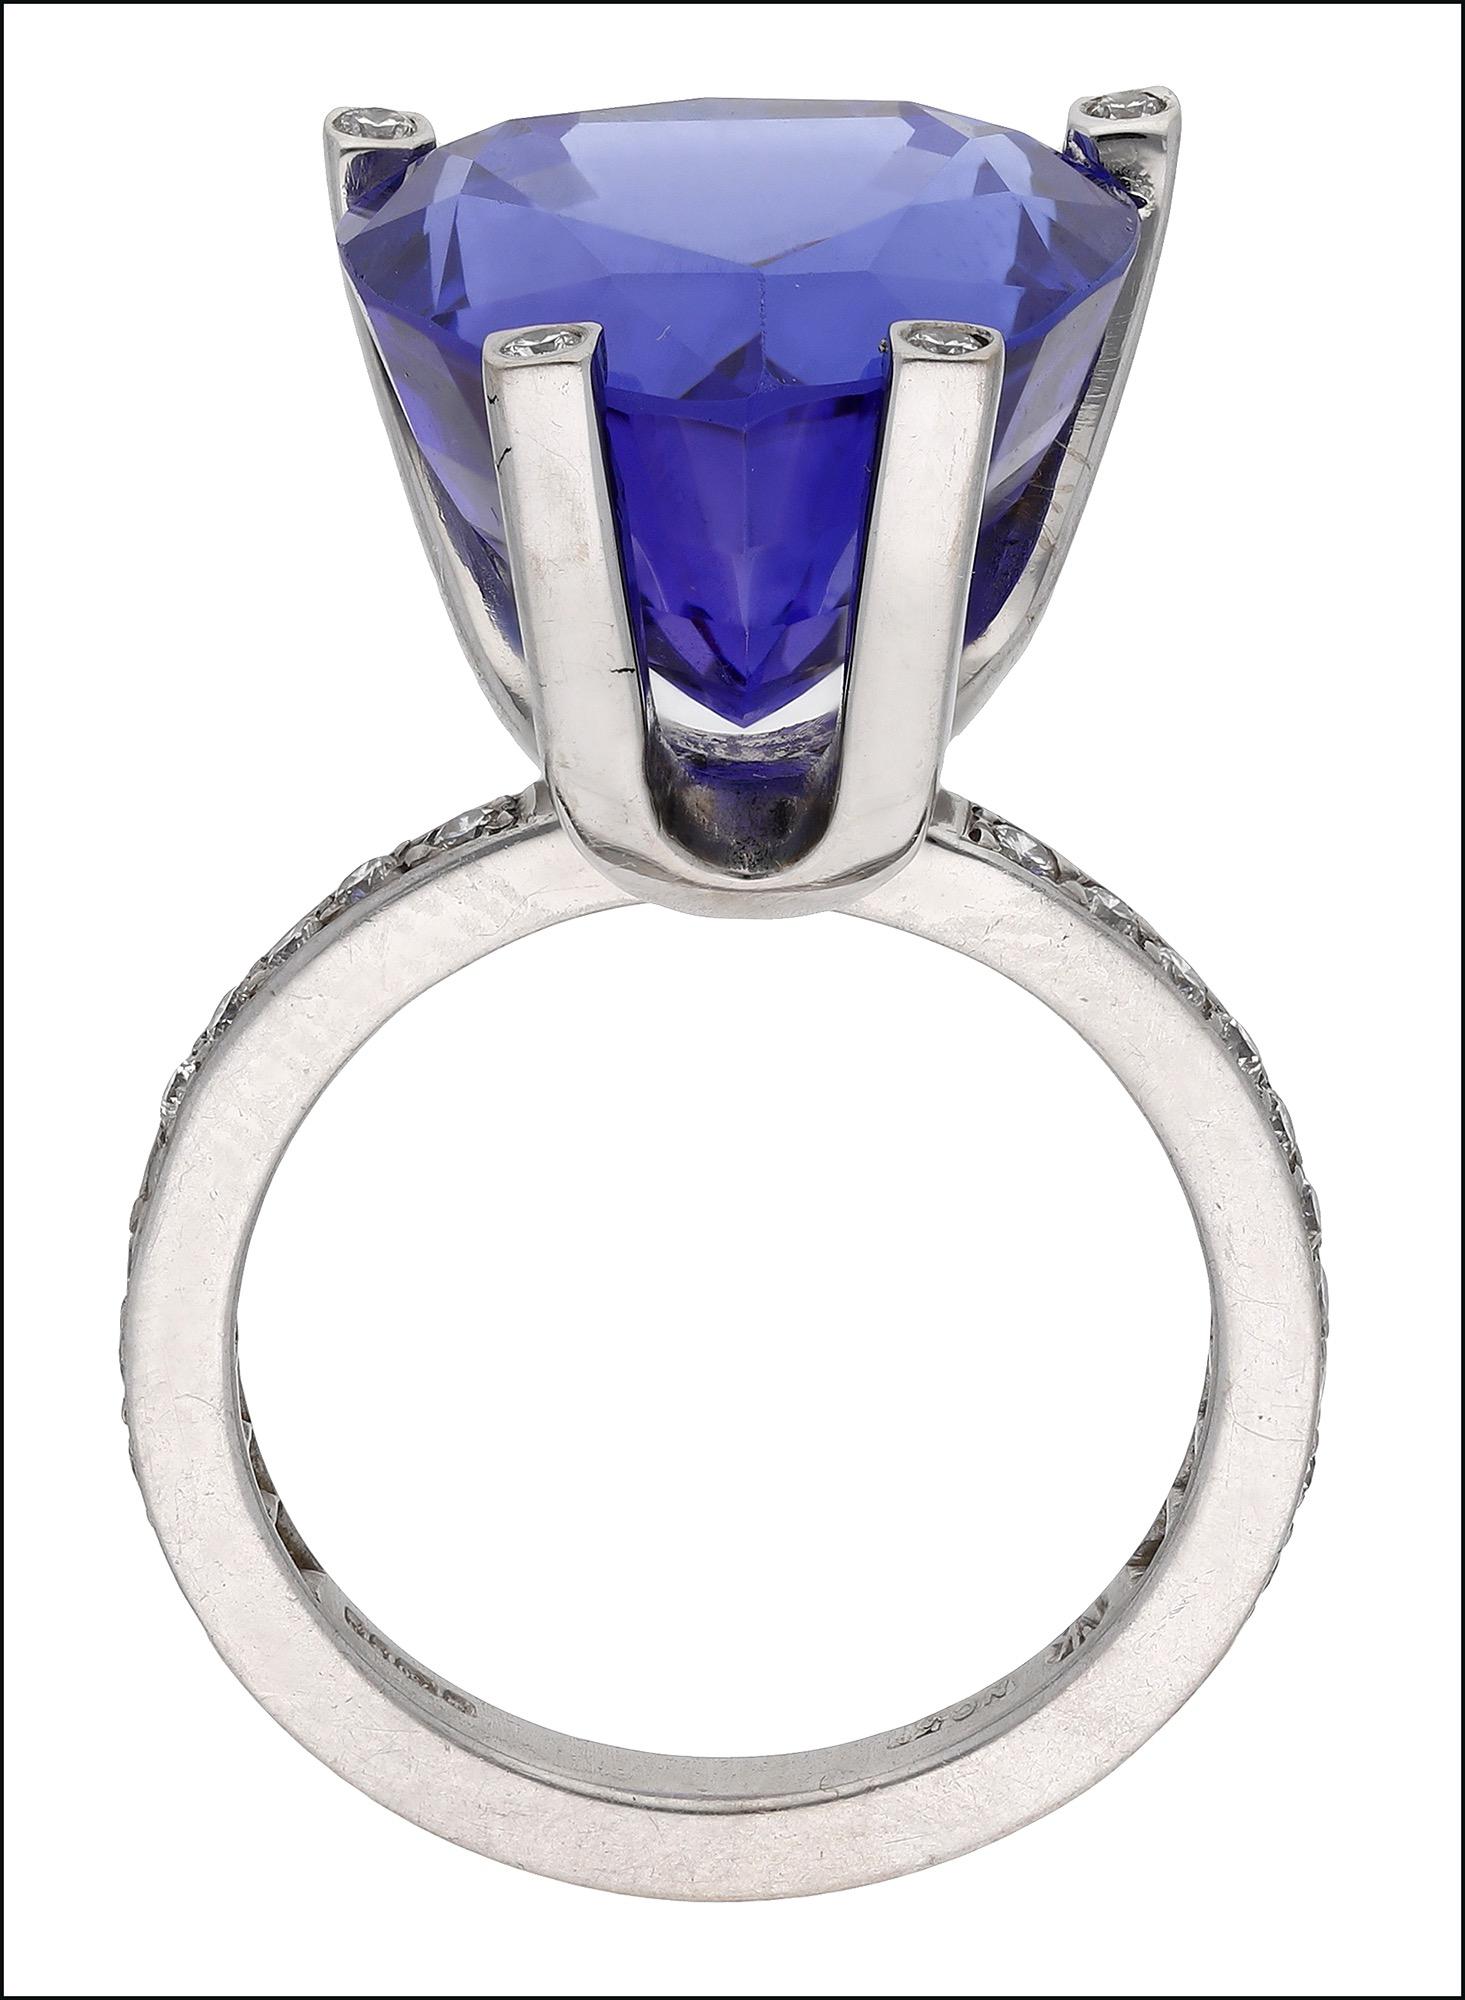 Jewellery - Image 2 of 3